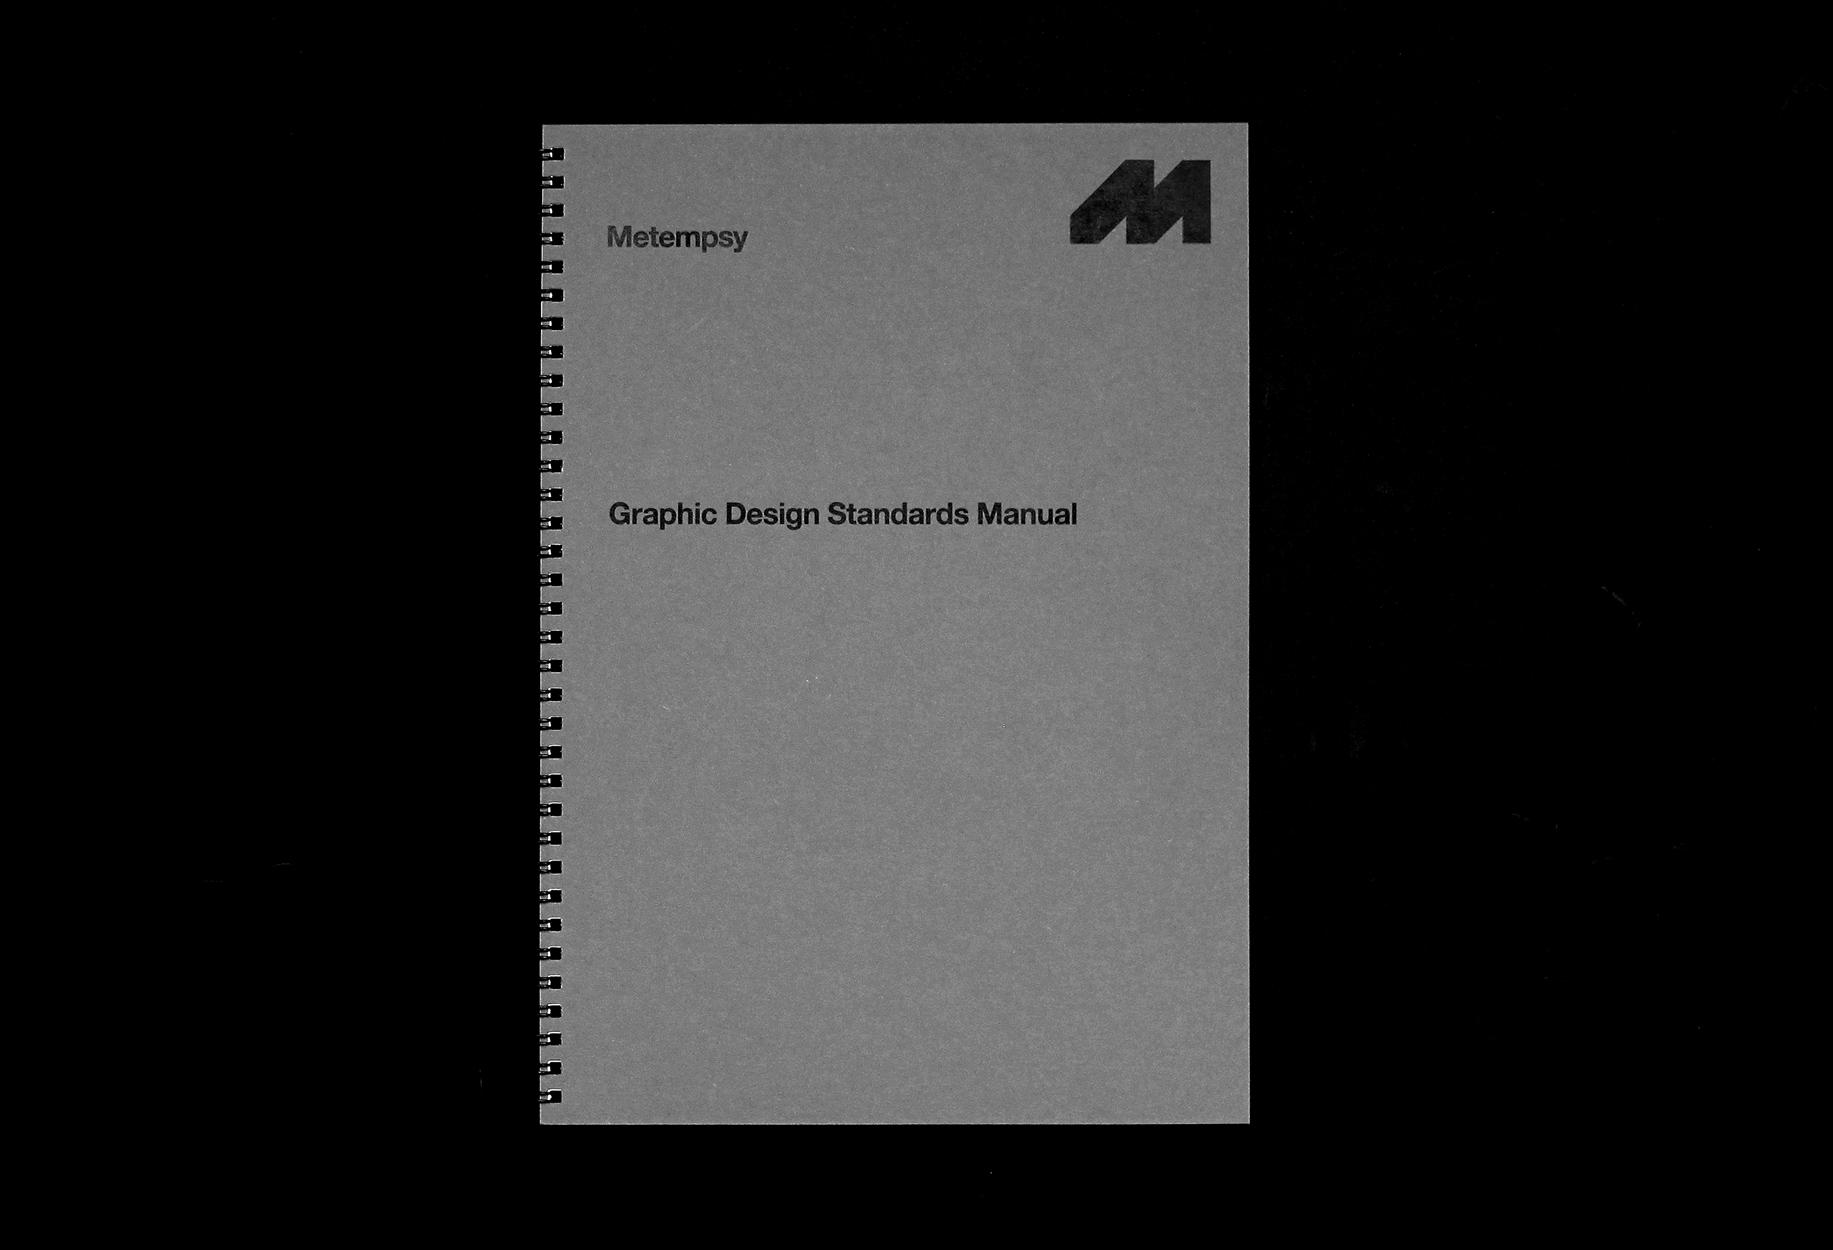 Metempsy-Graphic-Design-Standards-Manual-.jpg